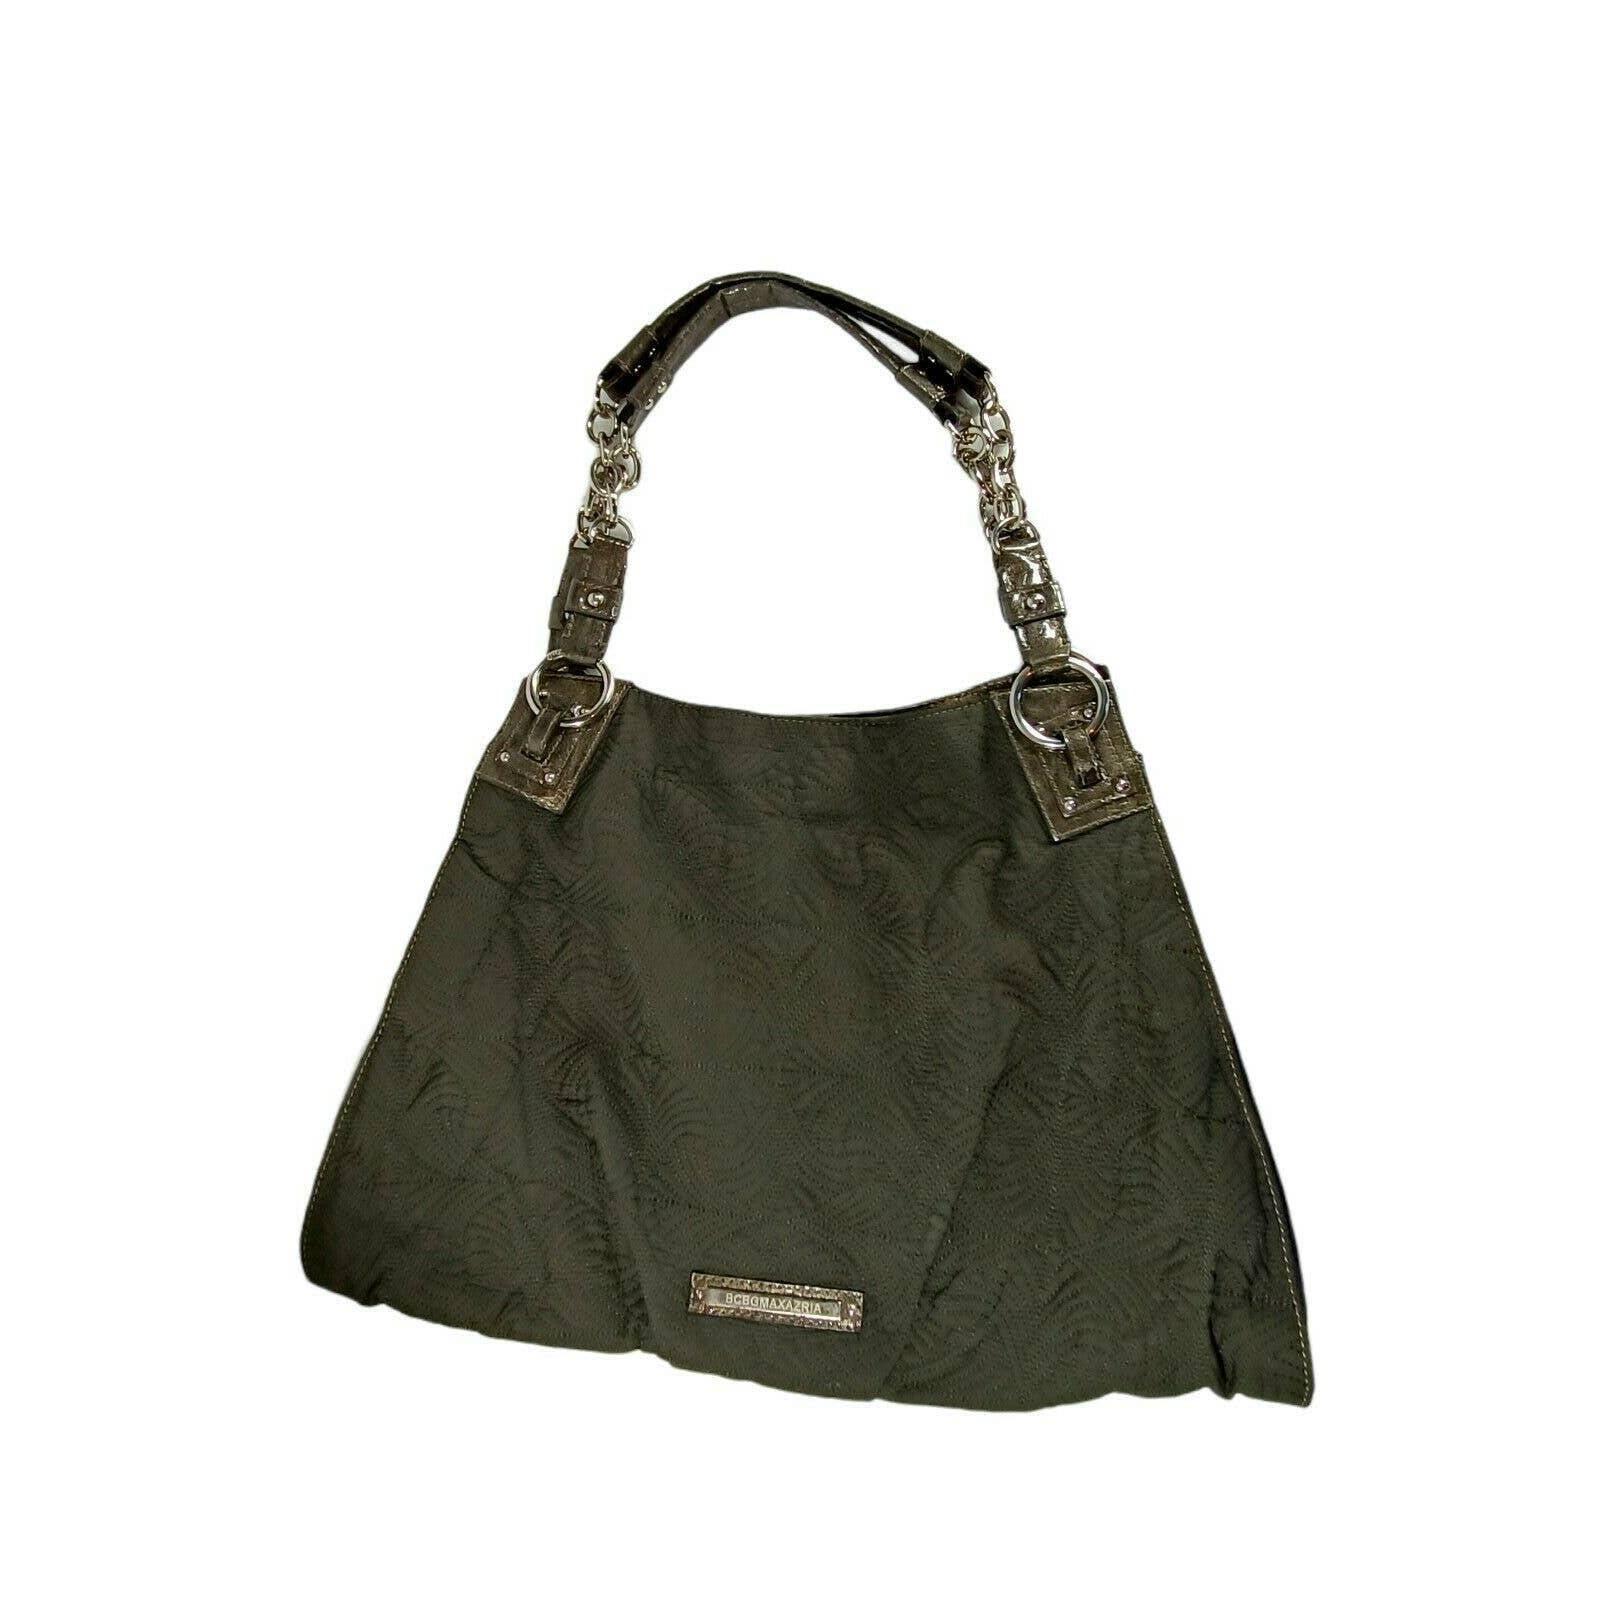 BCBGMAXARIA Women's Shoulder Bag Tote